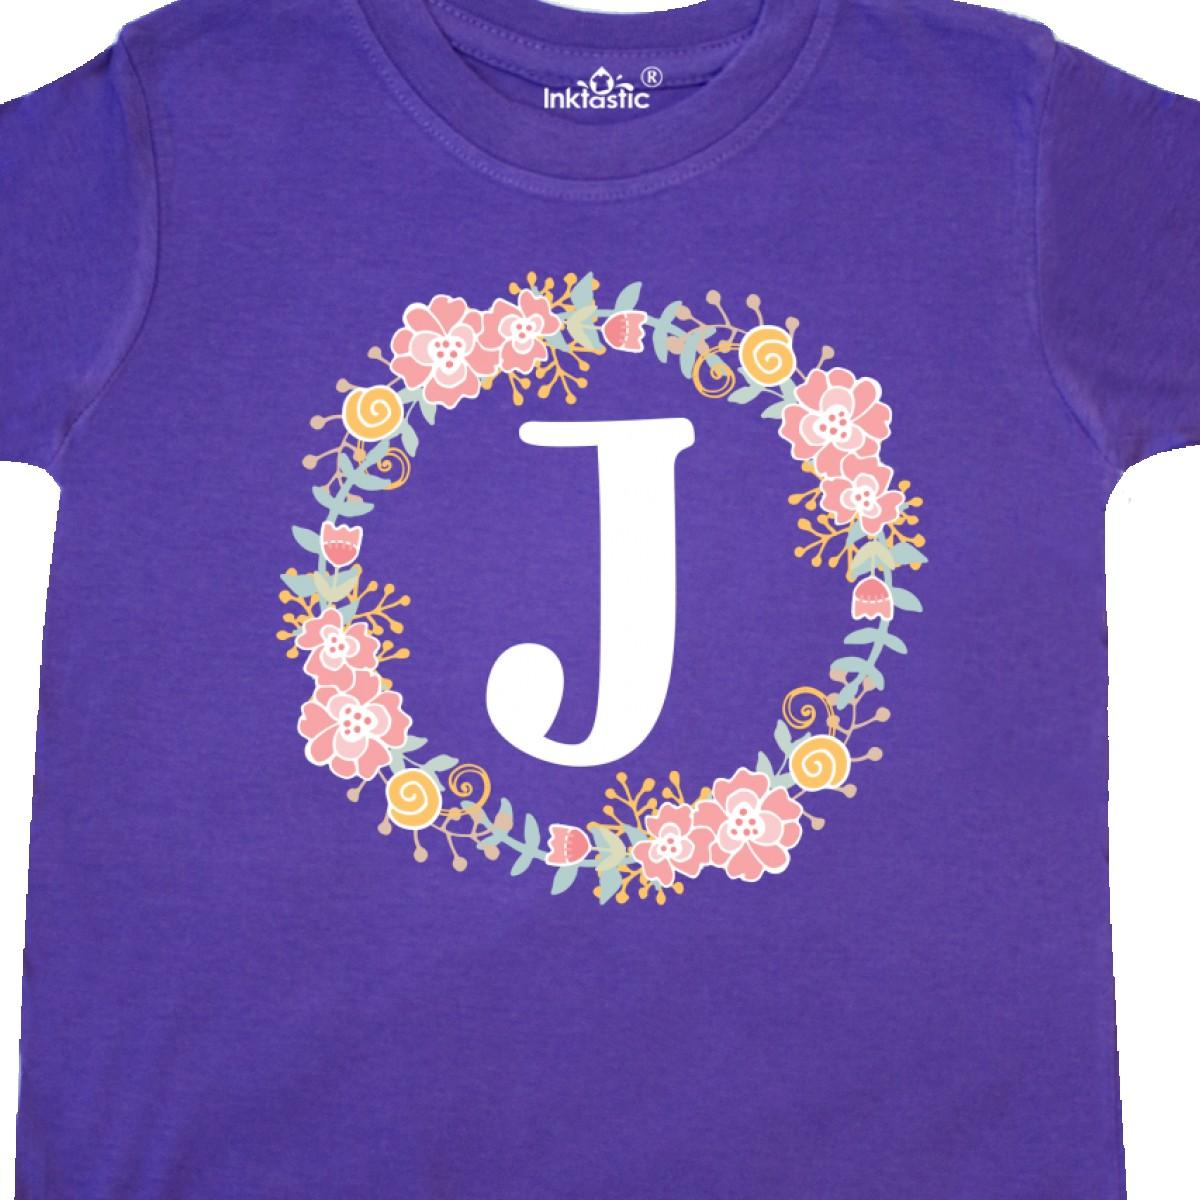 inktastic Flower Girl Lavender Bridal Toddler T-Shirt